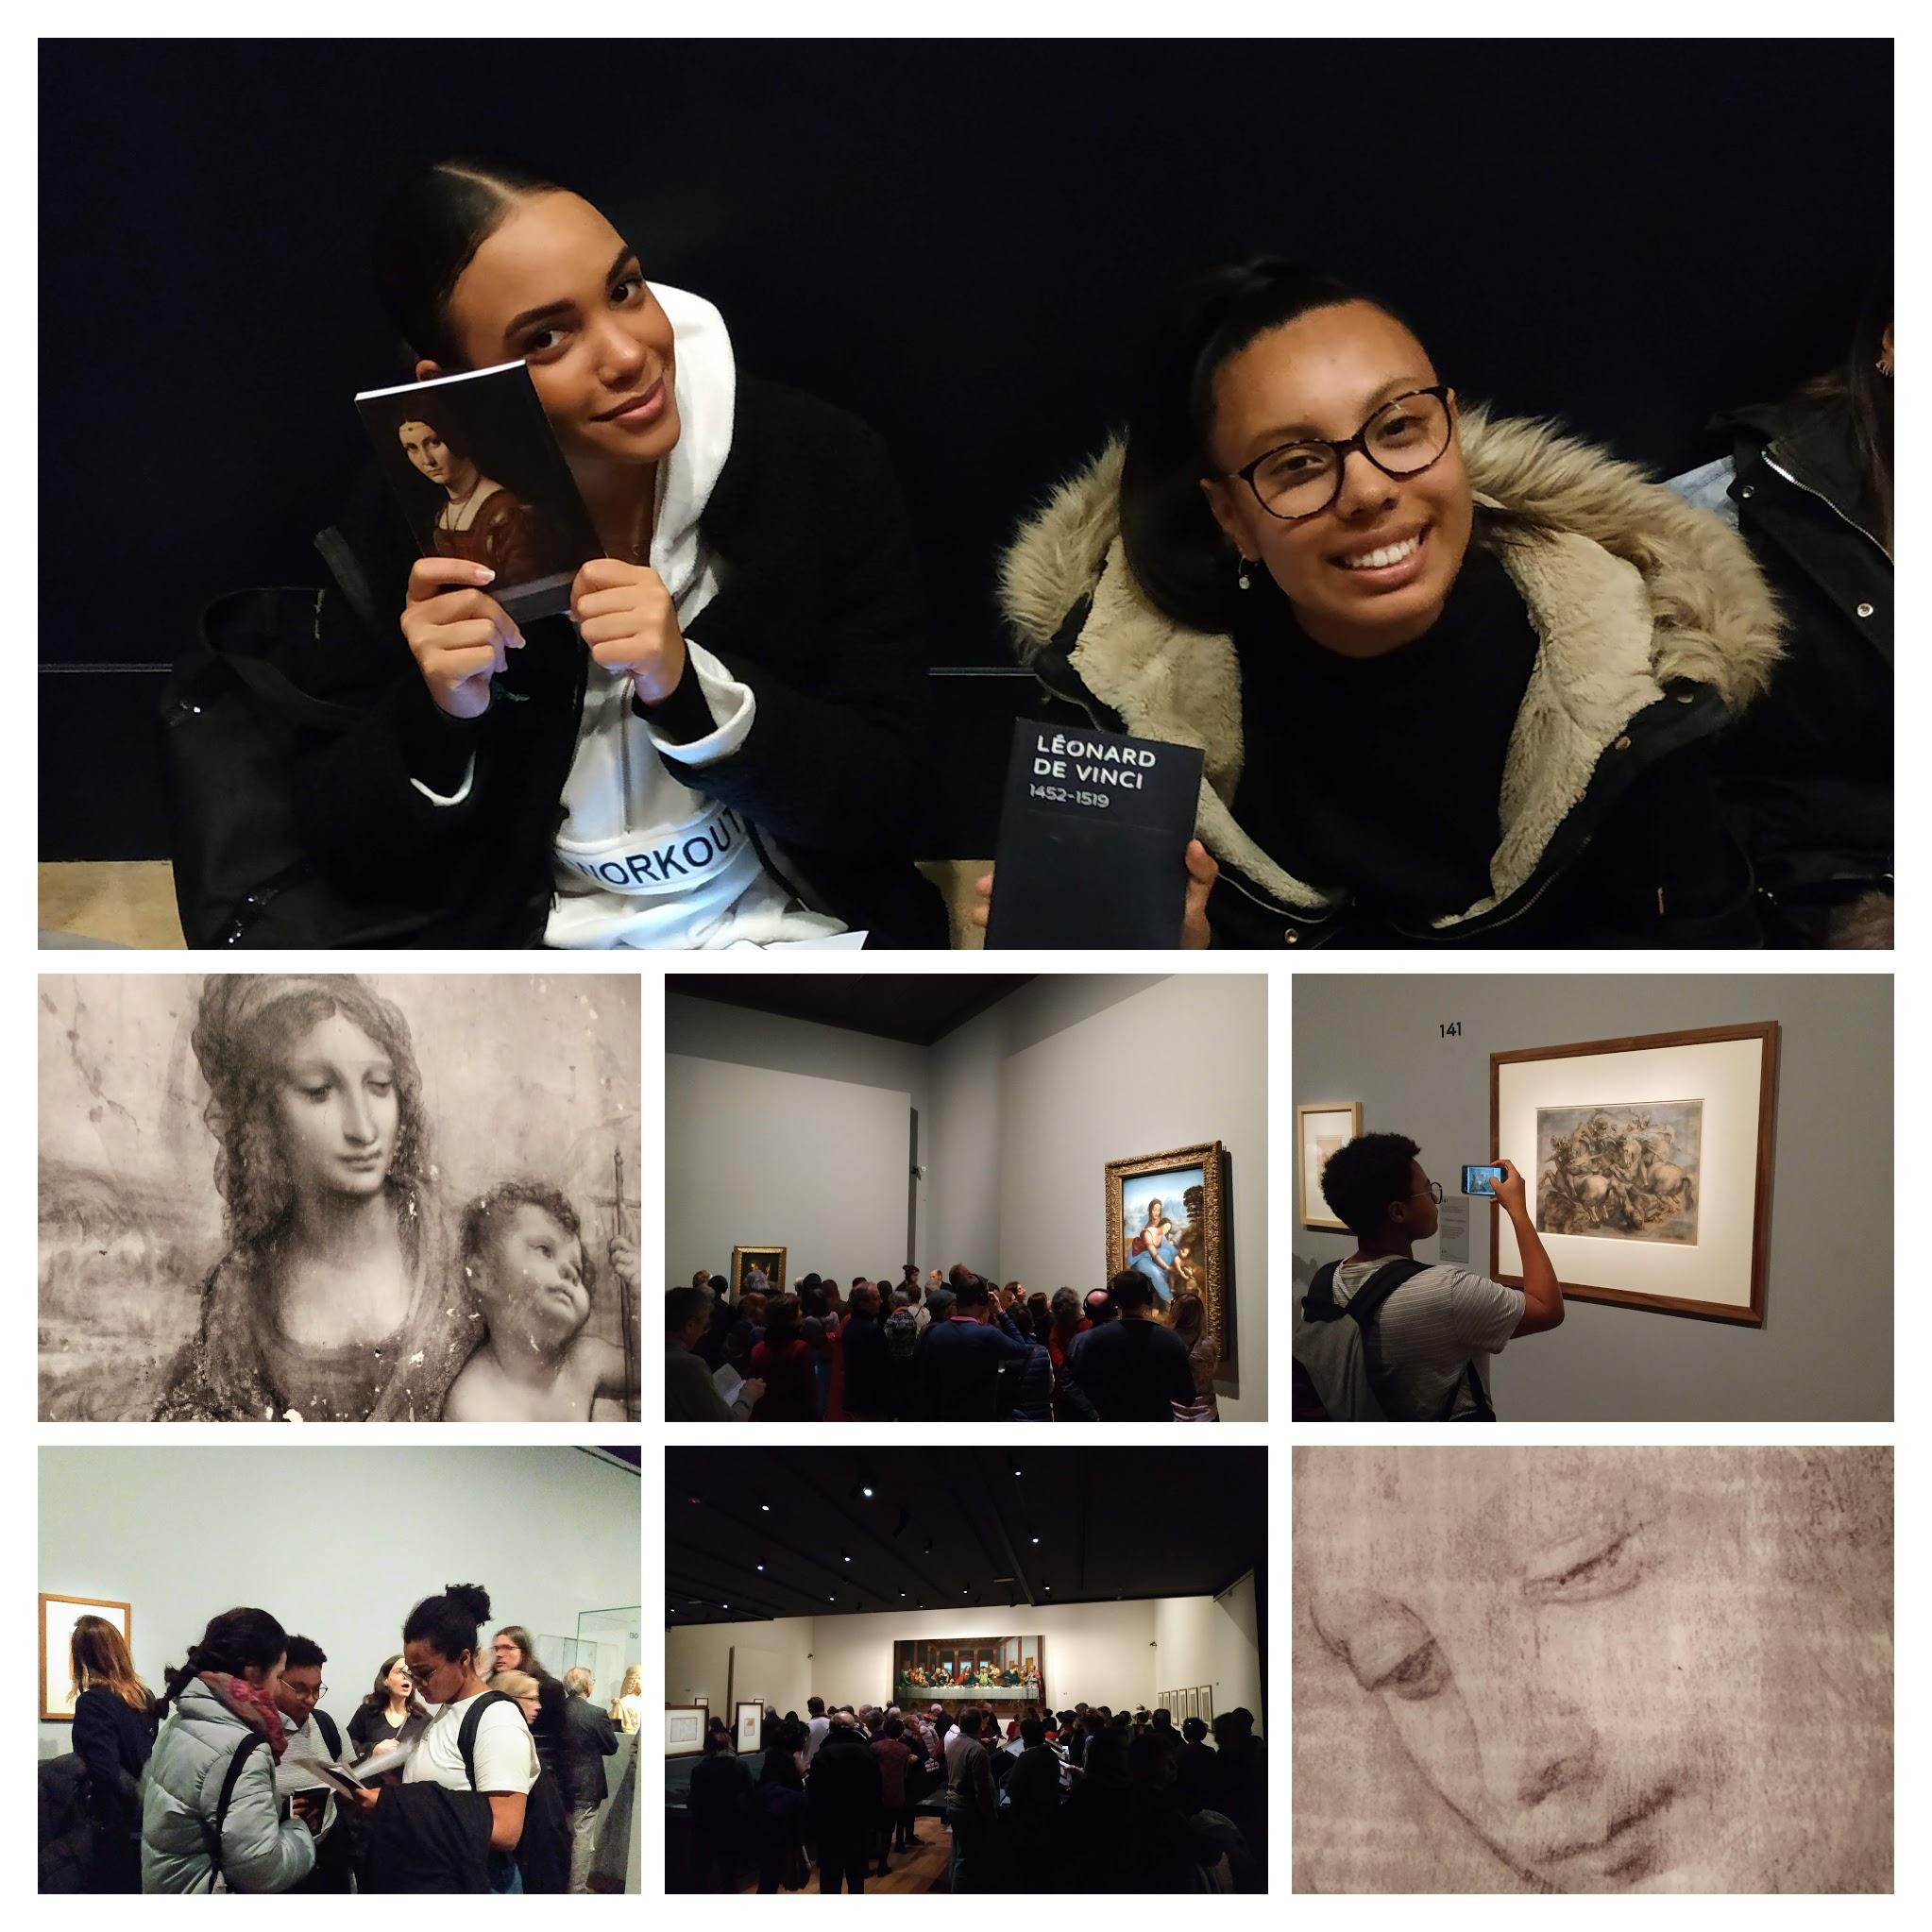 Exposition Leonardo Da Vinciau Louvre!